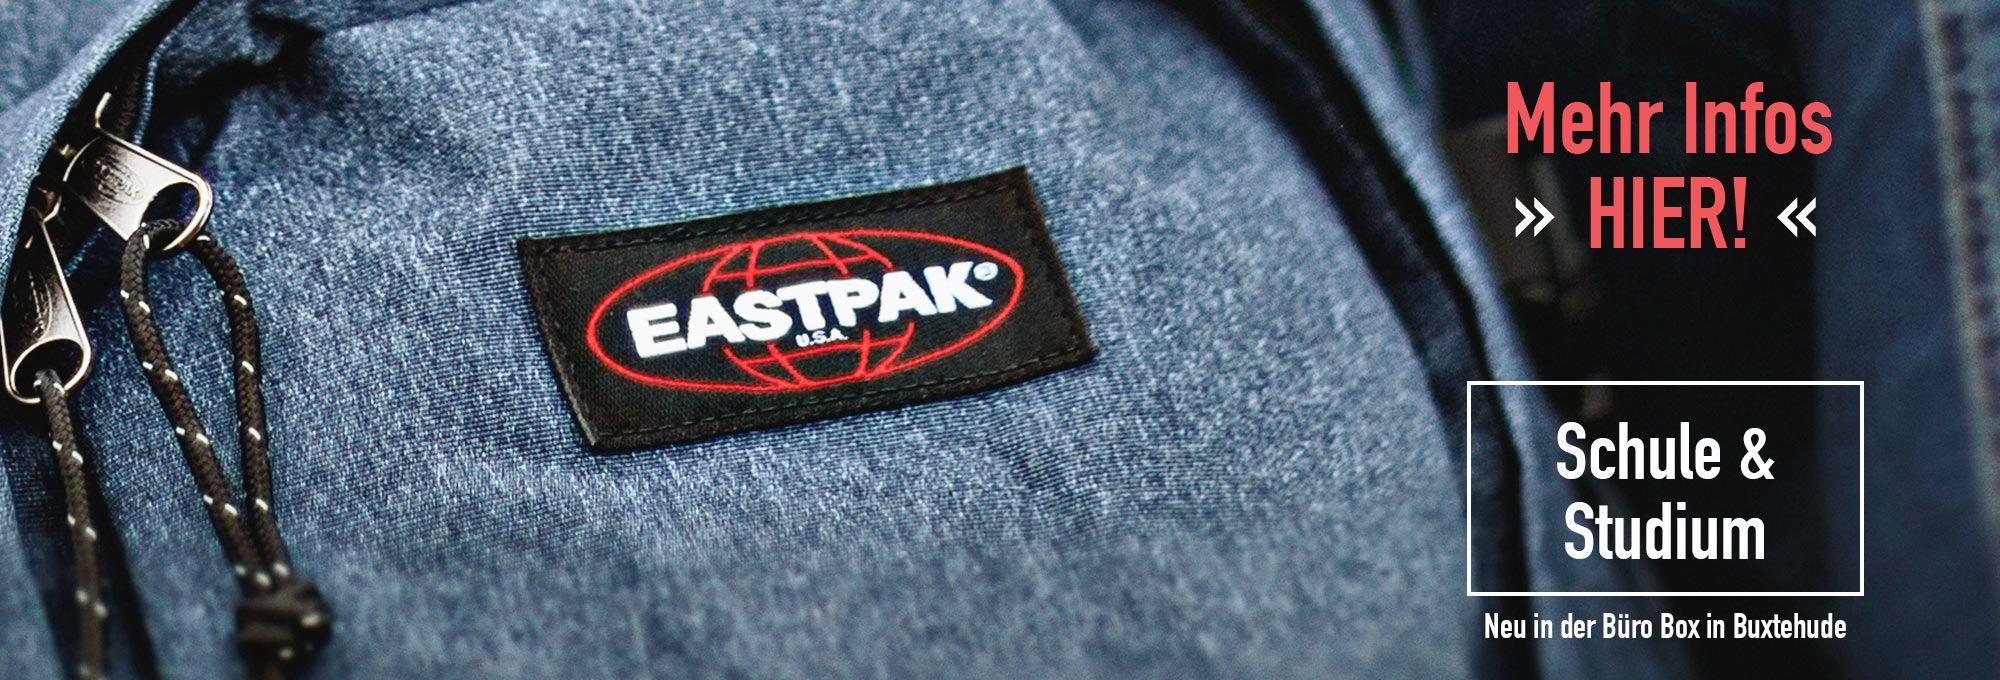 Büro Box Buxtehuder Büroartikel Markt: EASTPAK